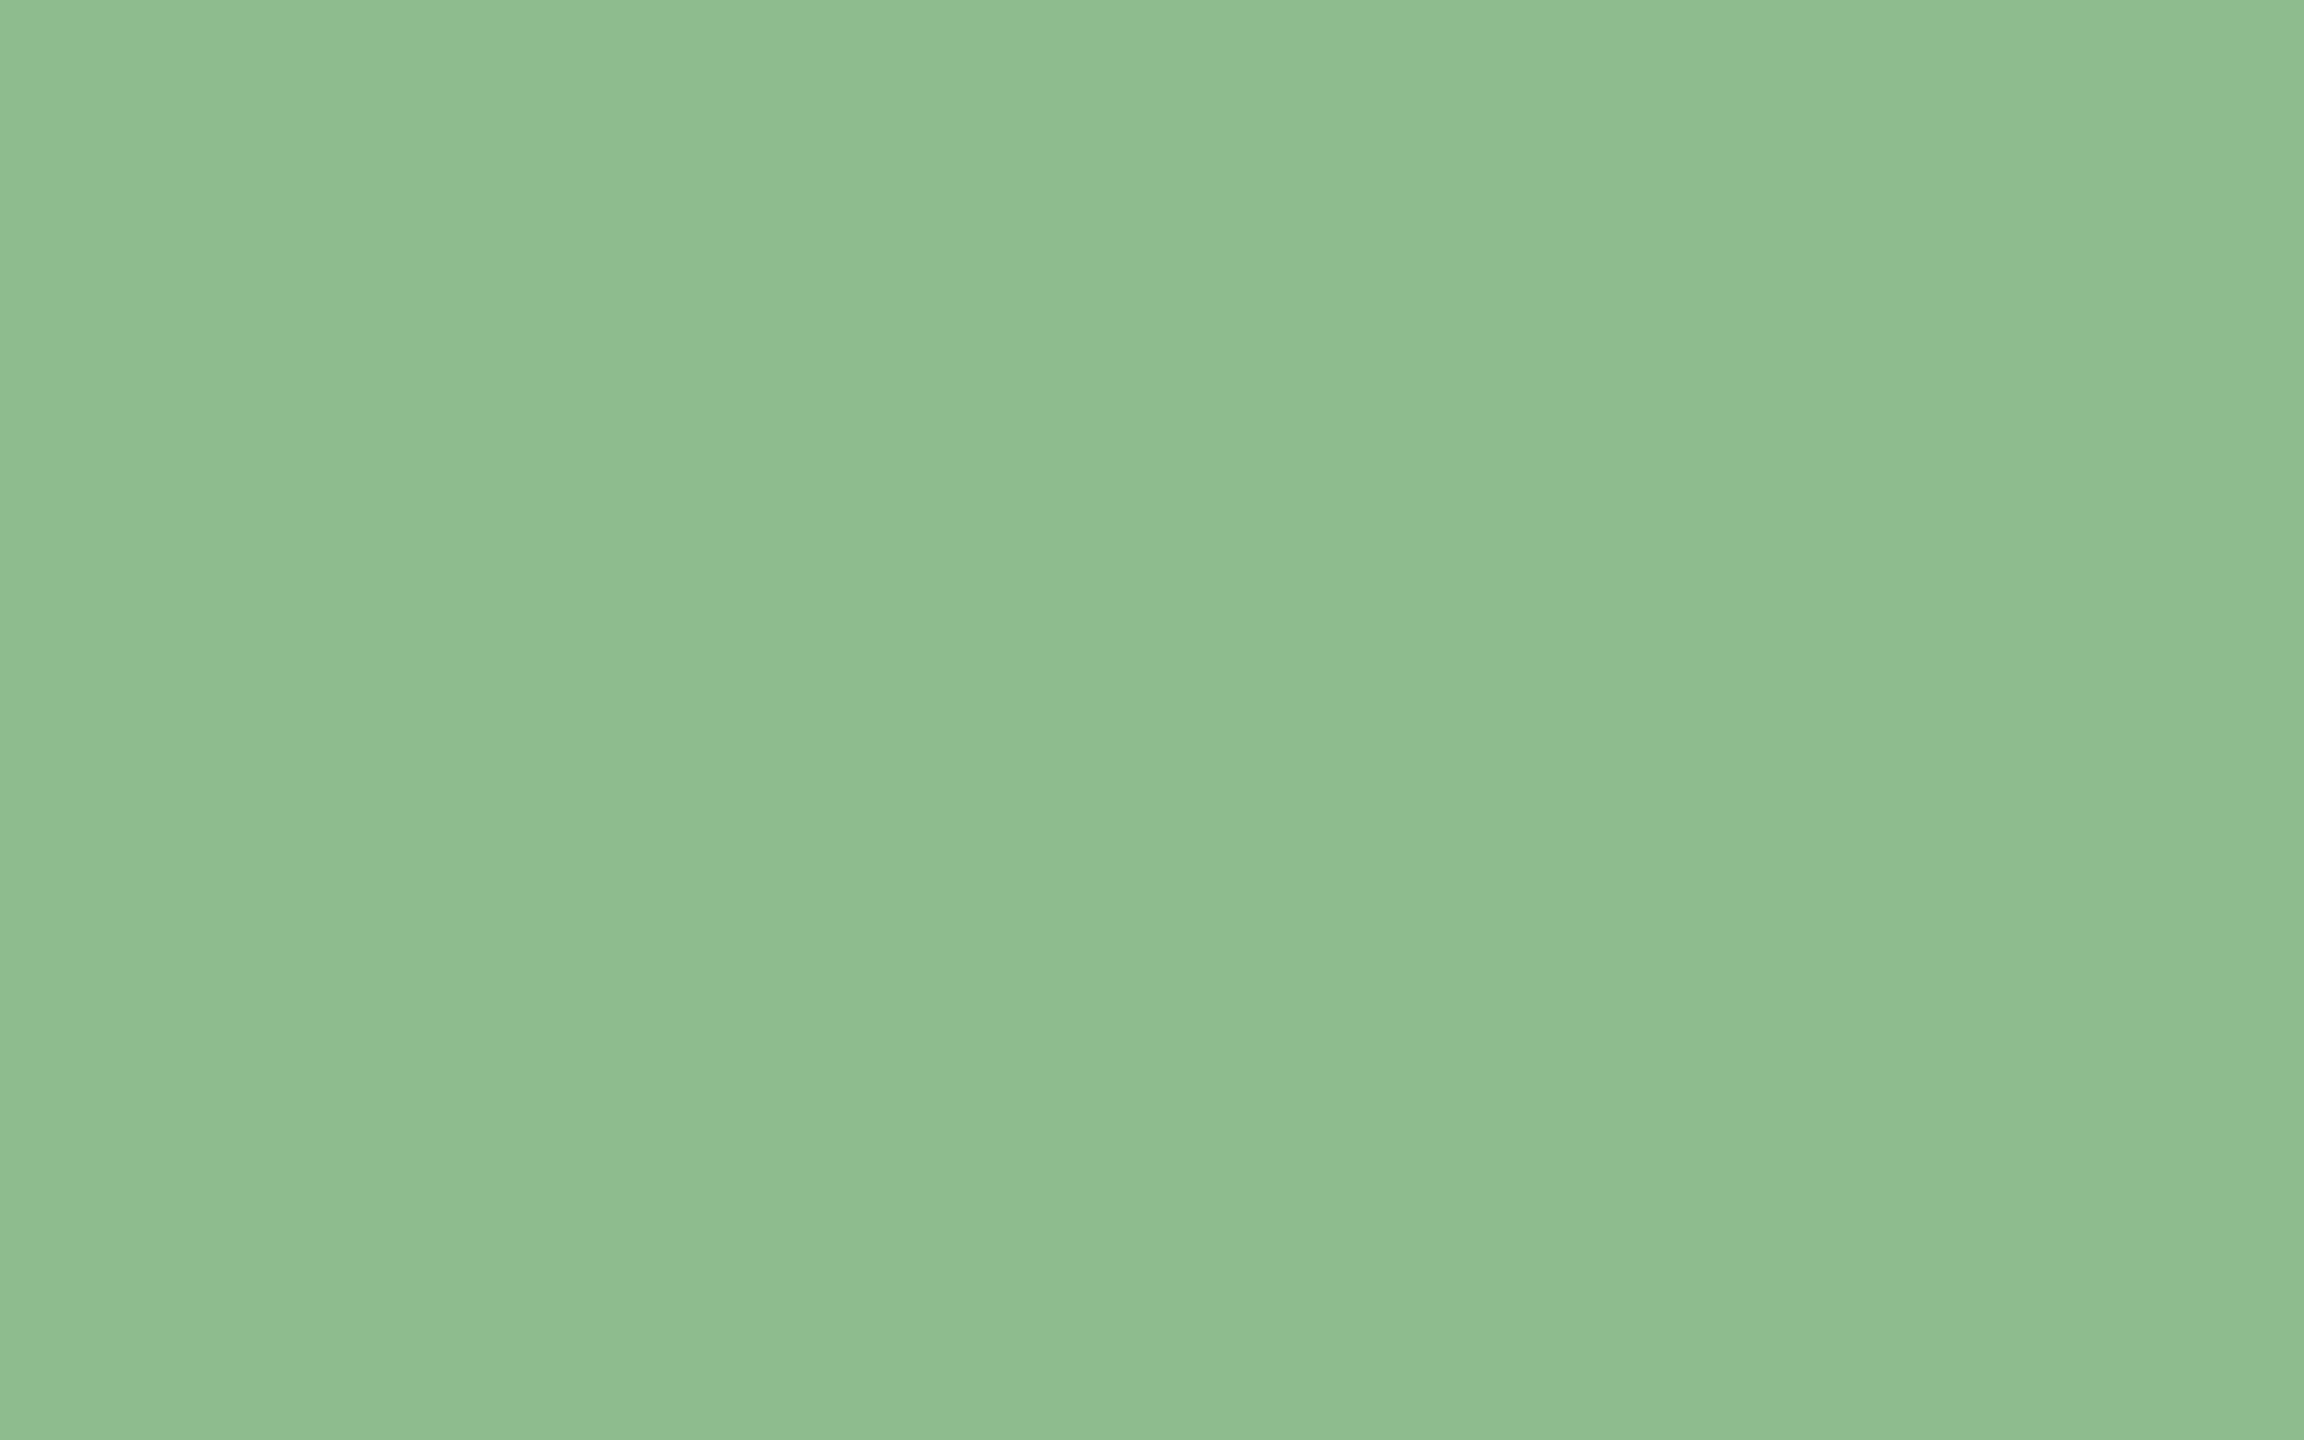 2304x1440 Dark Sea Green Solid Color Background